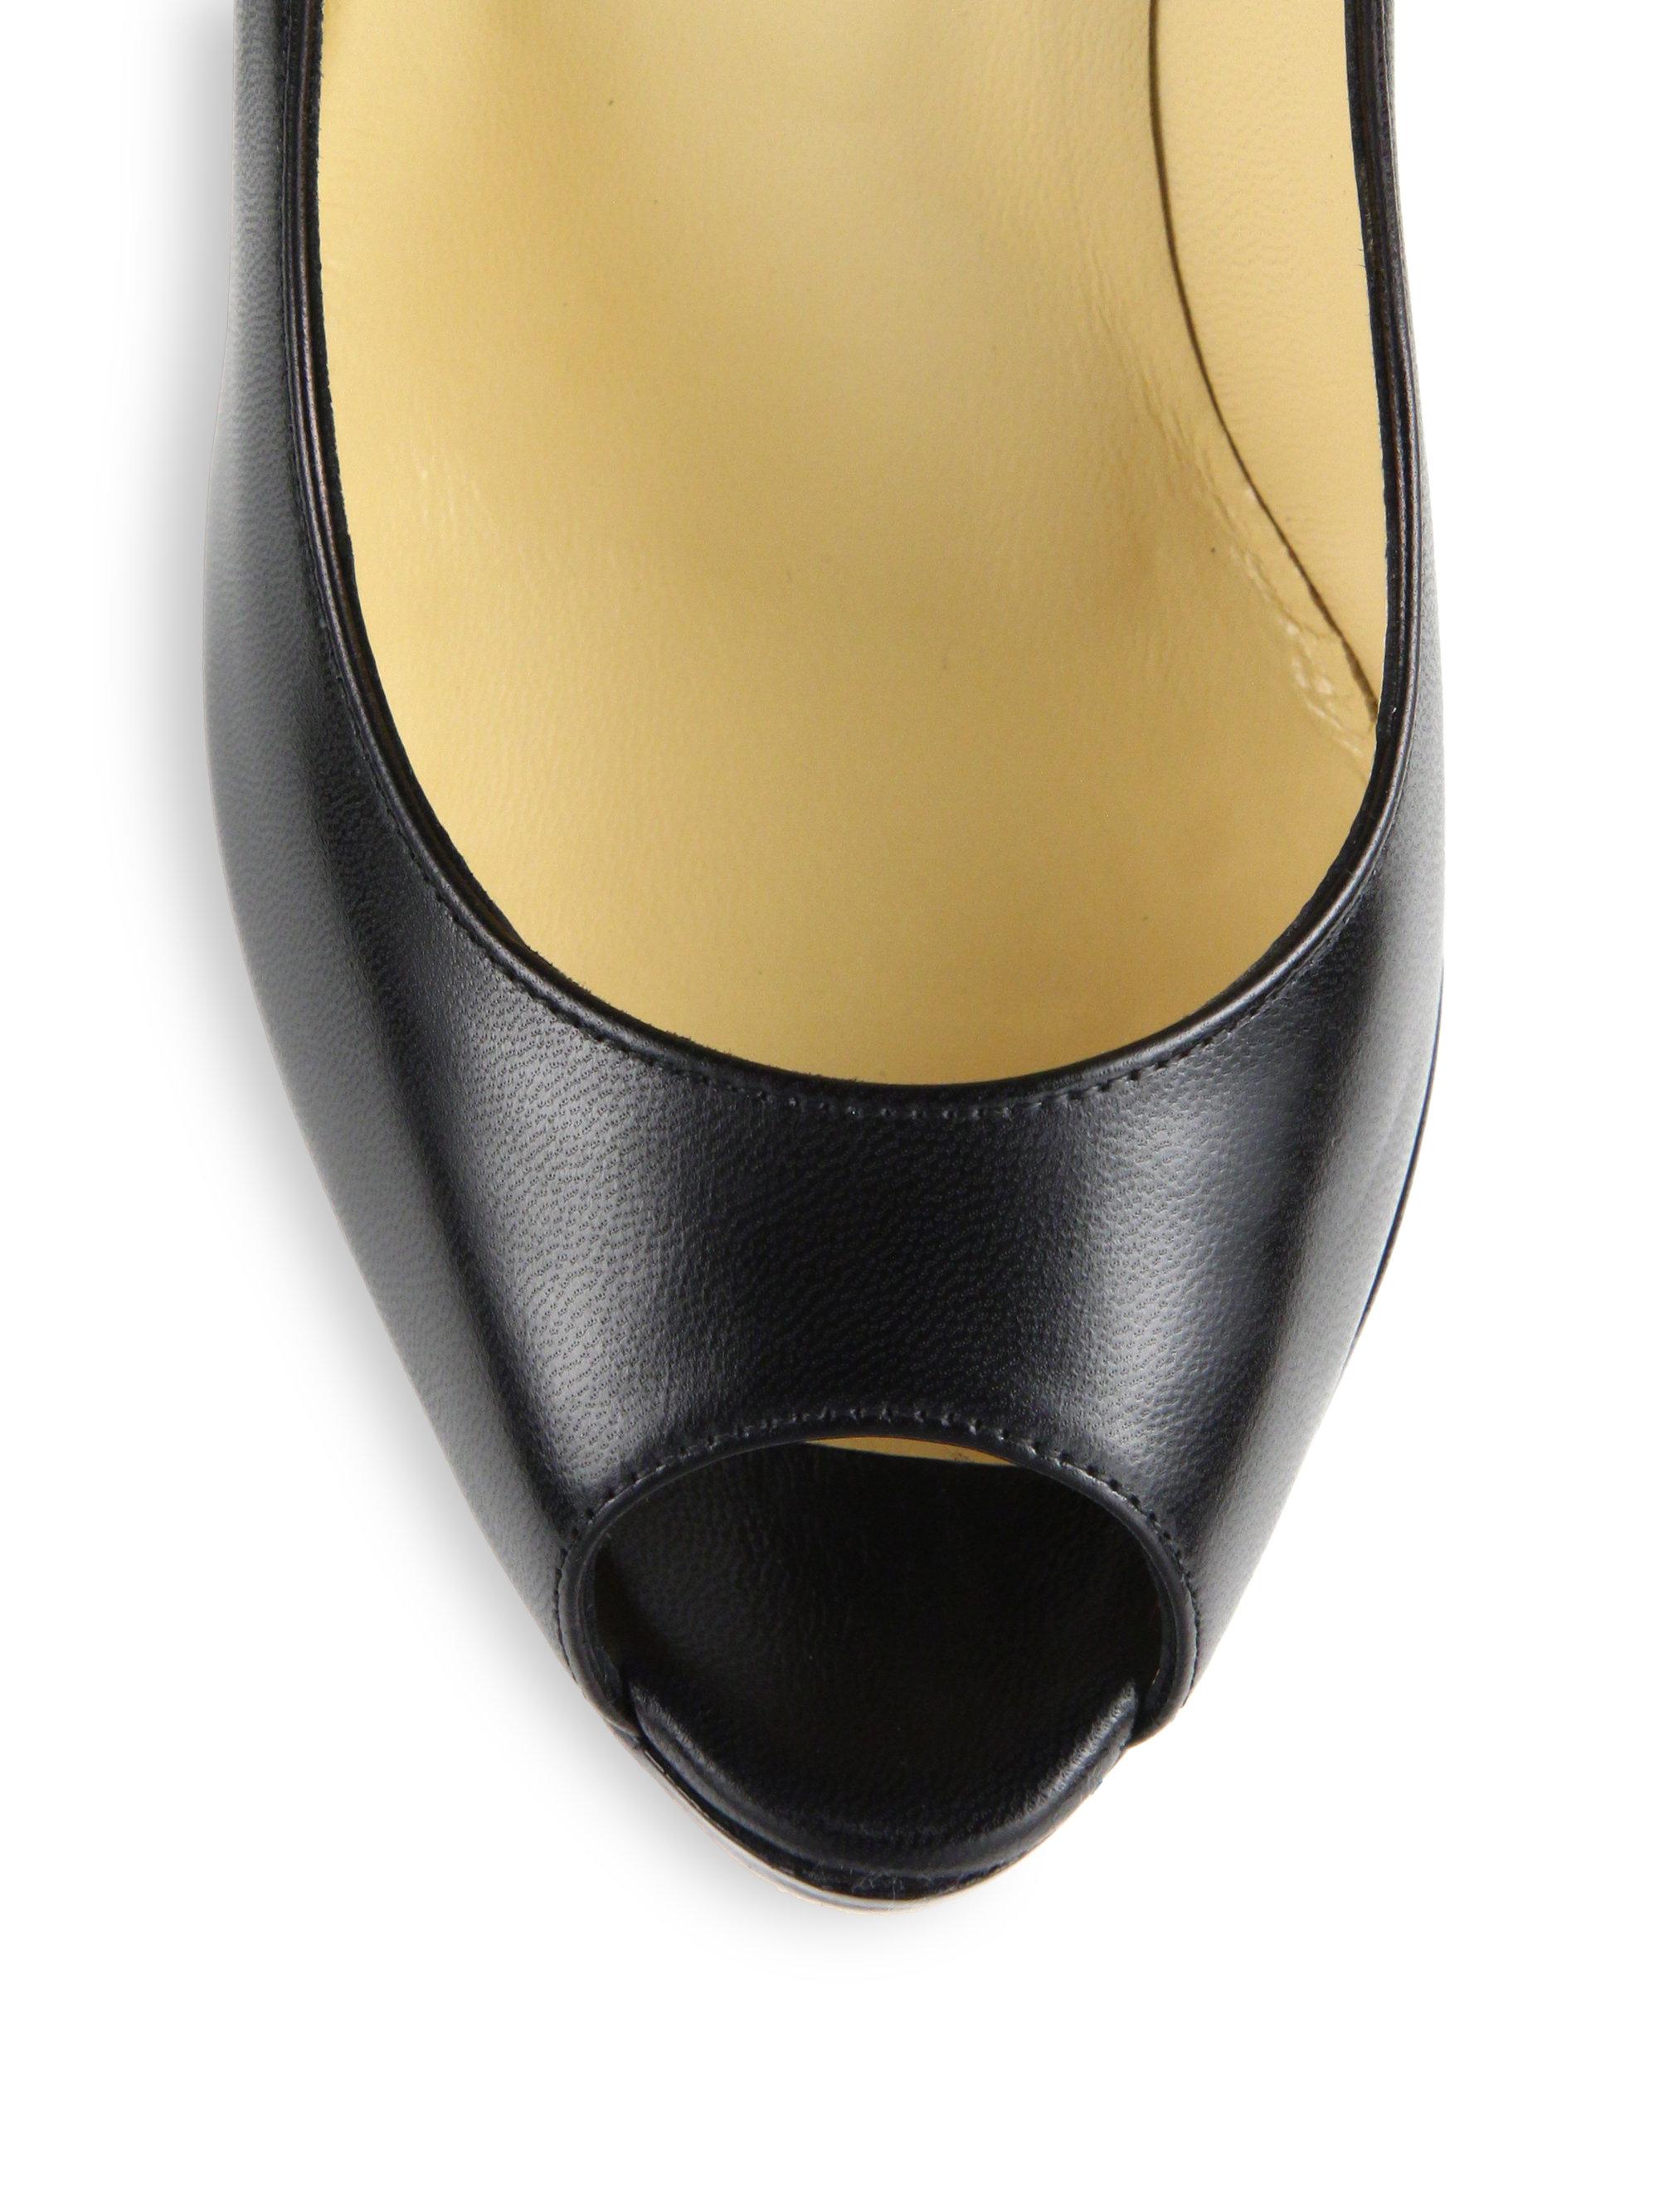 louboutin shoes replica - Christian louboutin Jamie Leather Platform Pumps in Black   Lyst